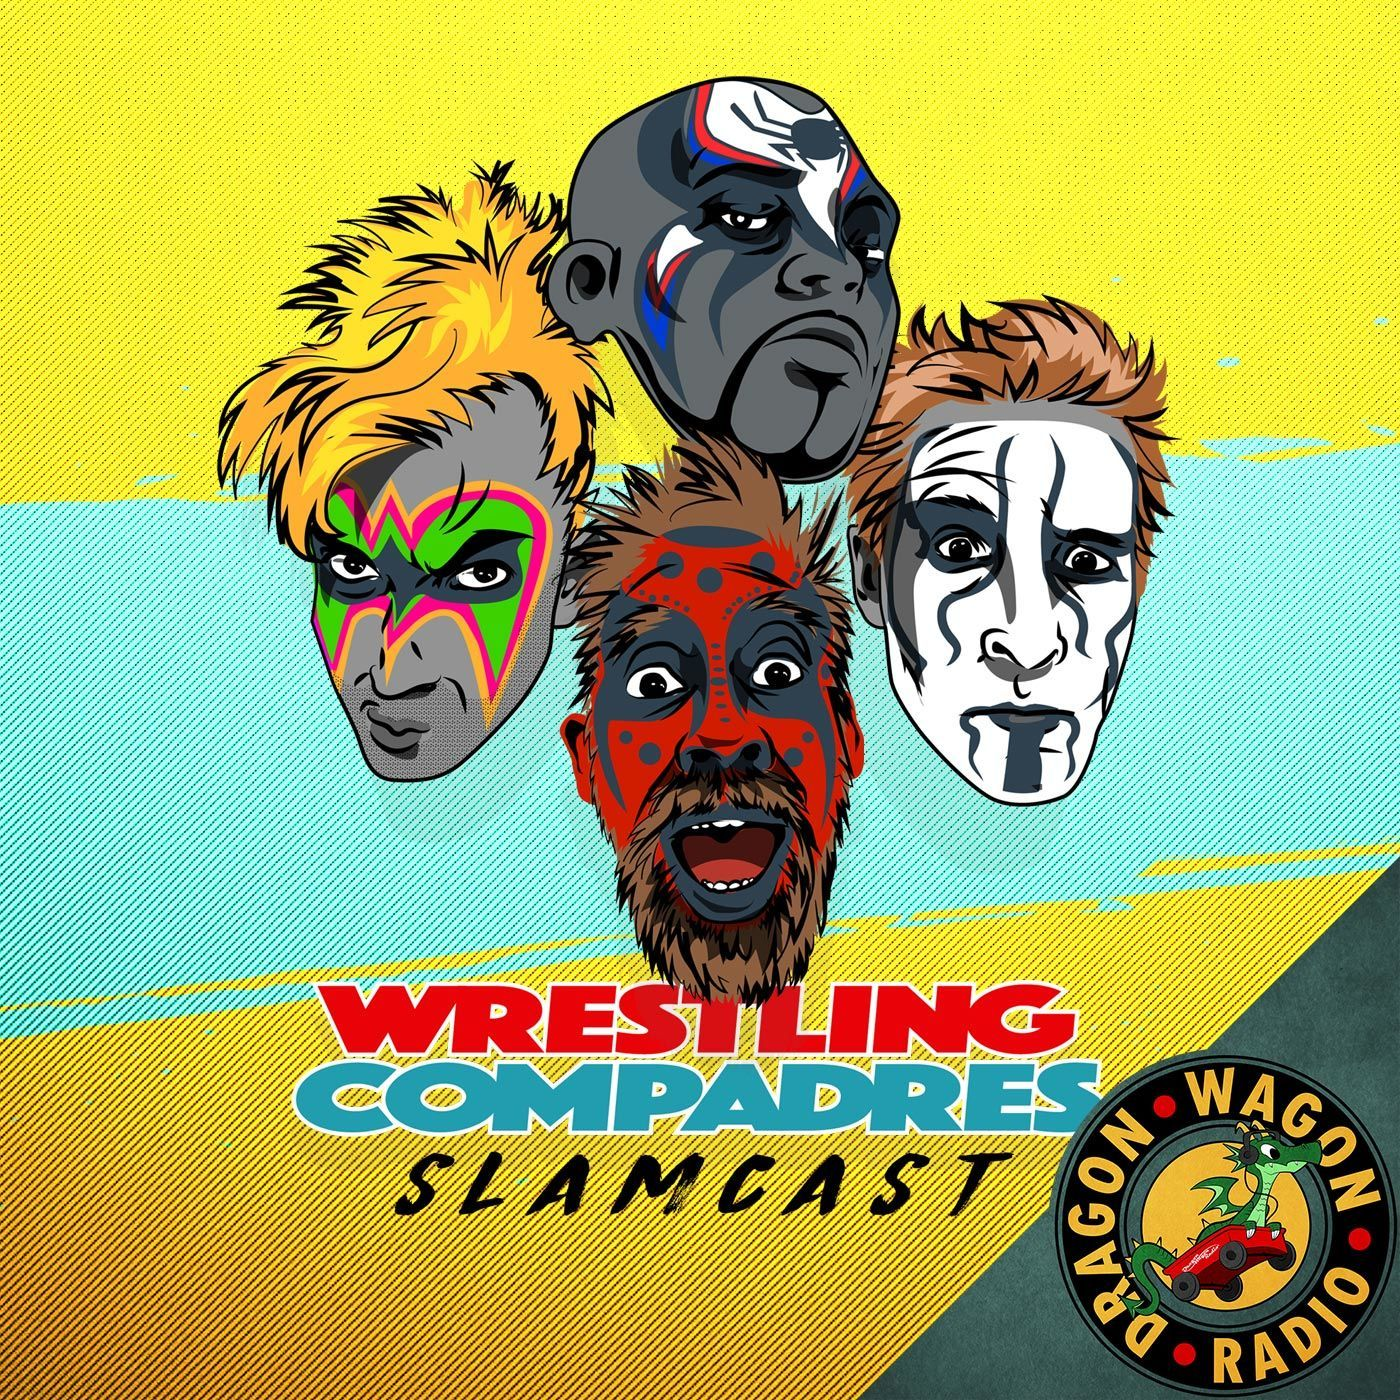 Artwork for Wrestlemania Extravaganza!